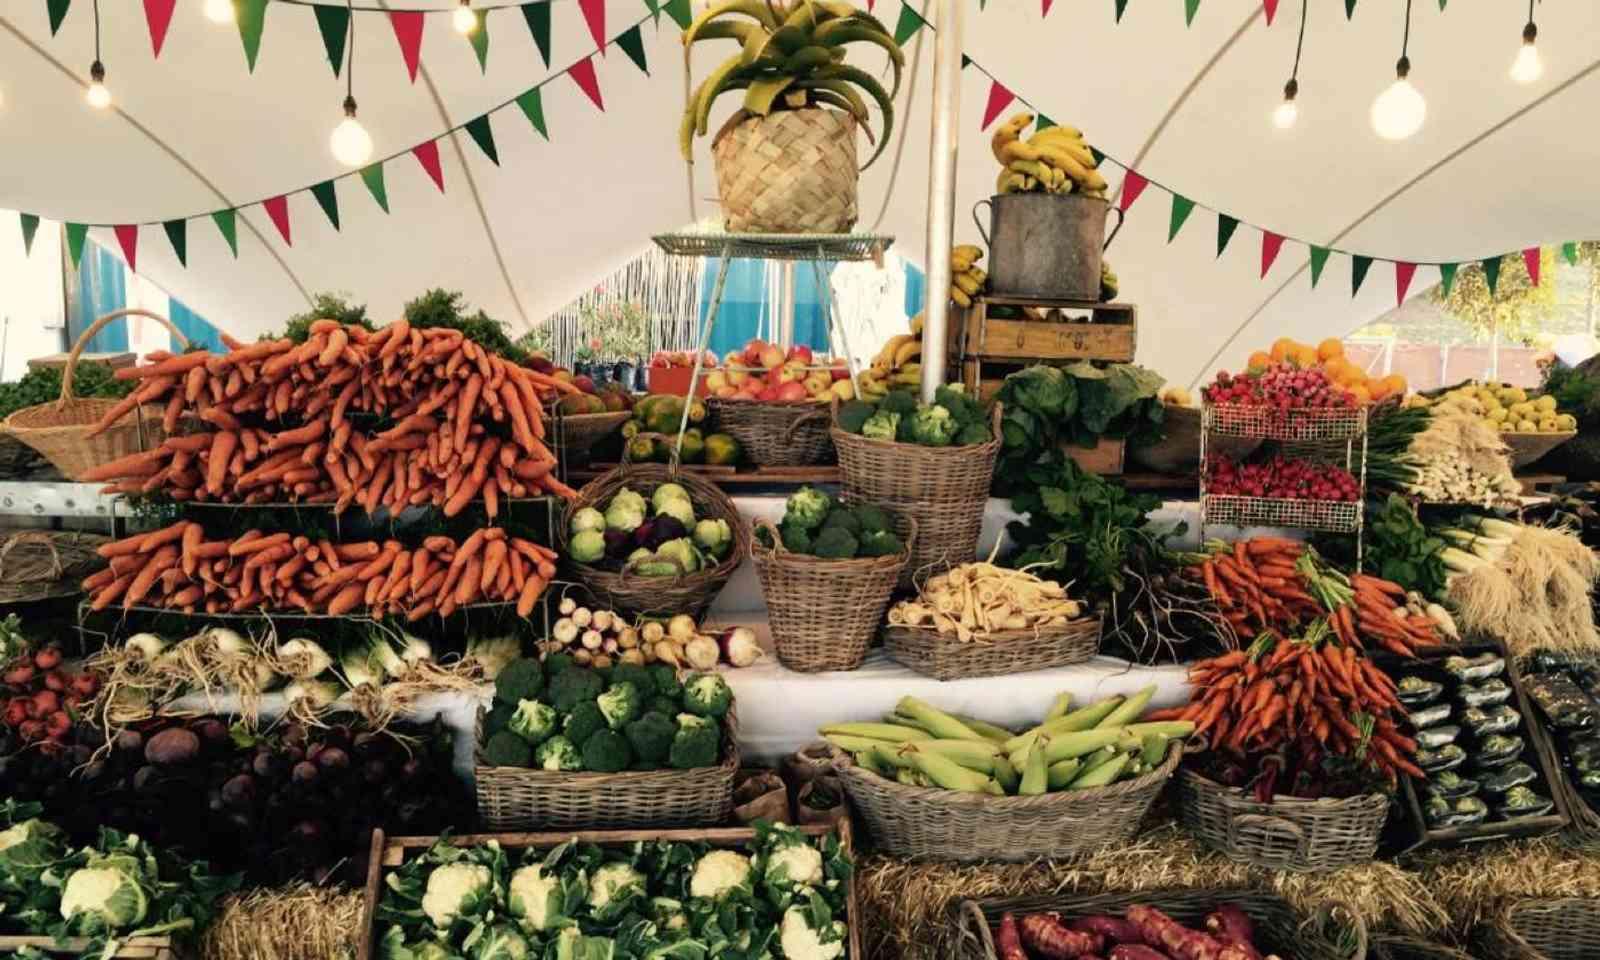 Vegetable display at Oranjezicht Market (Oranjezicht Market)